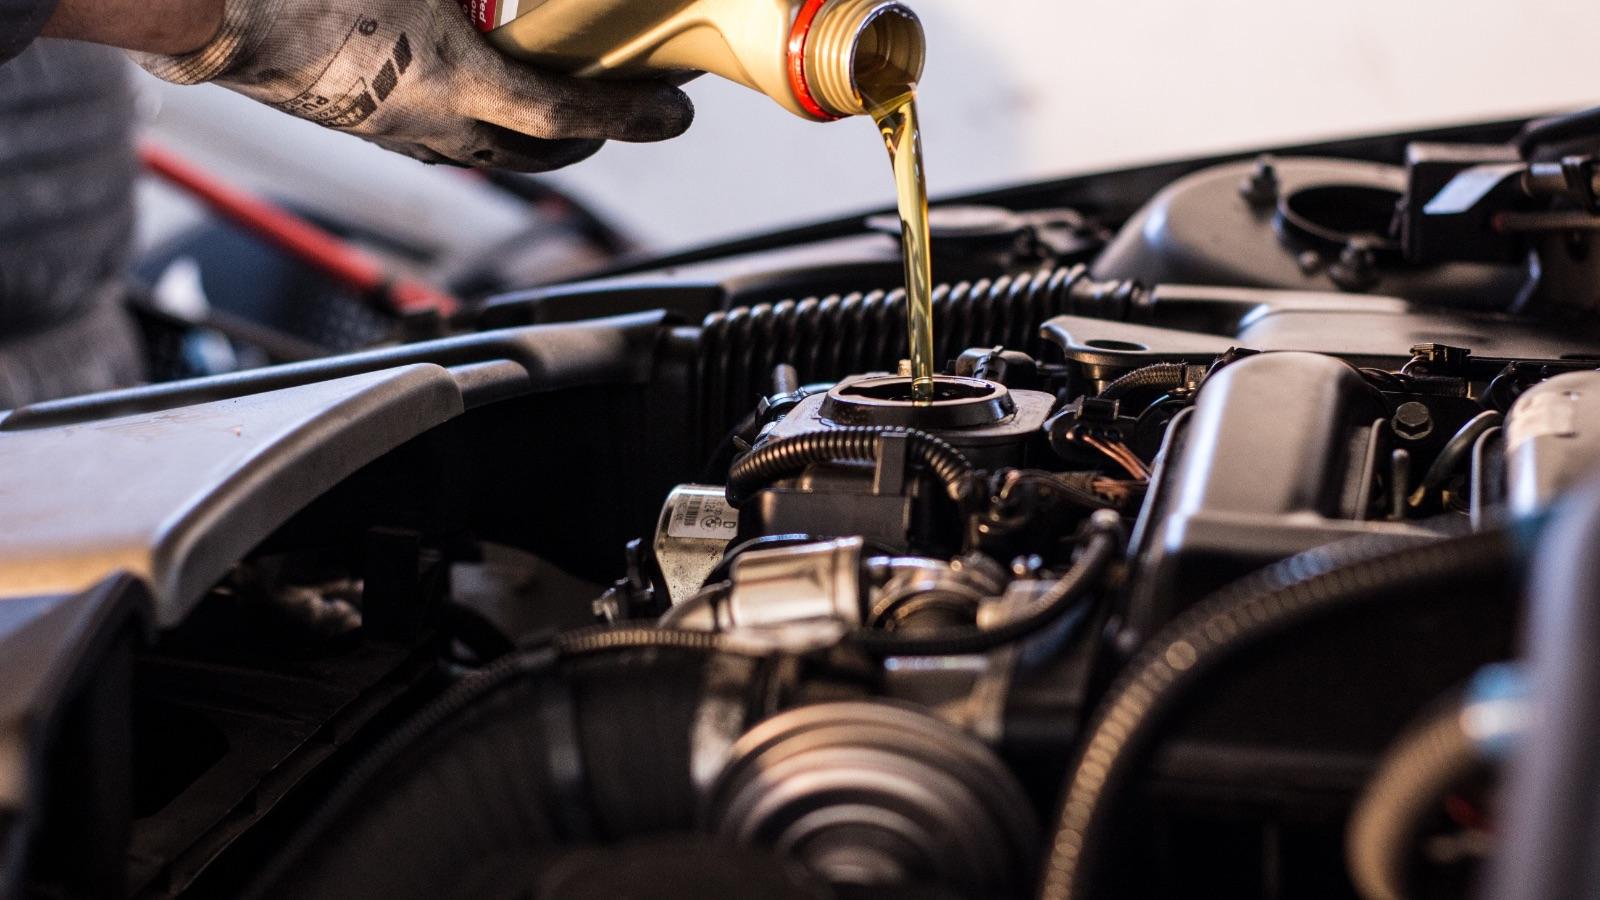 Servizi autofficina autorizzata bosch car service a Vimercate | O.P.R.A.